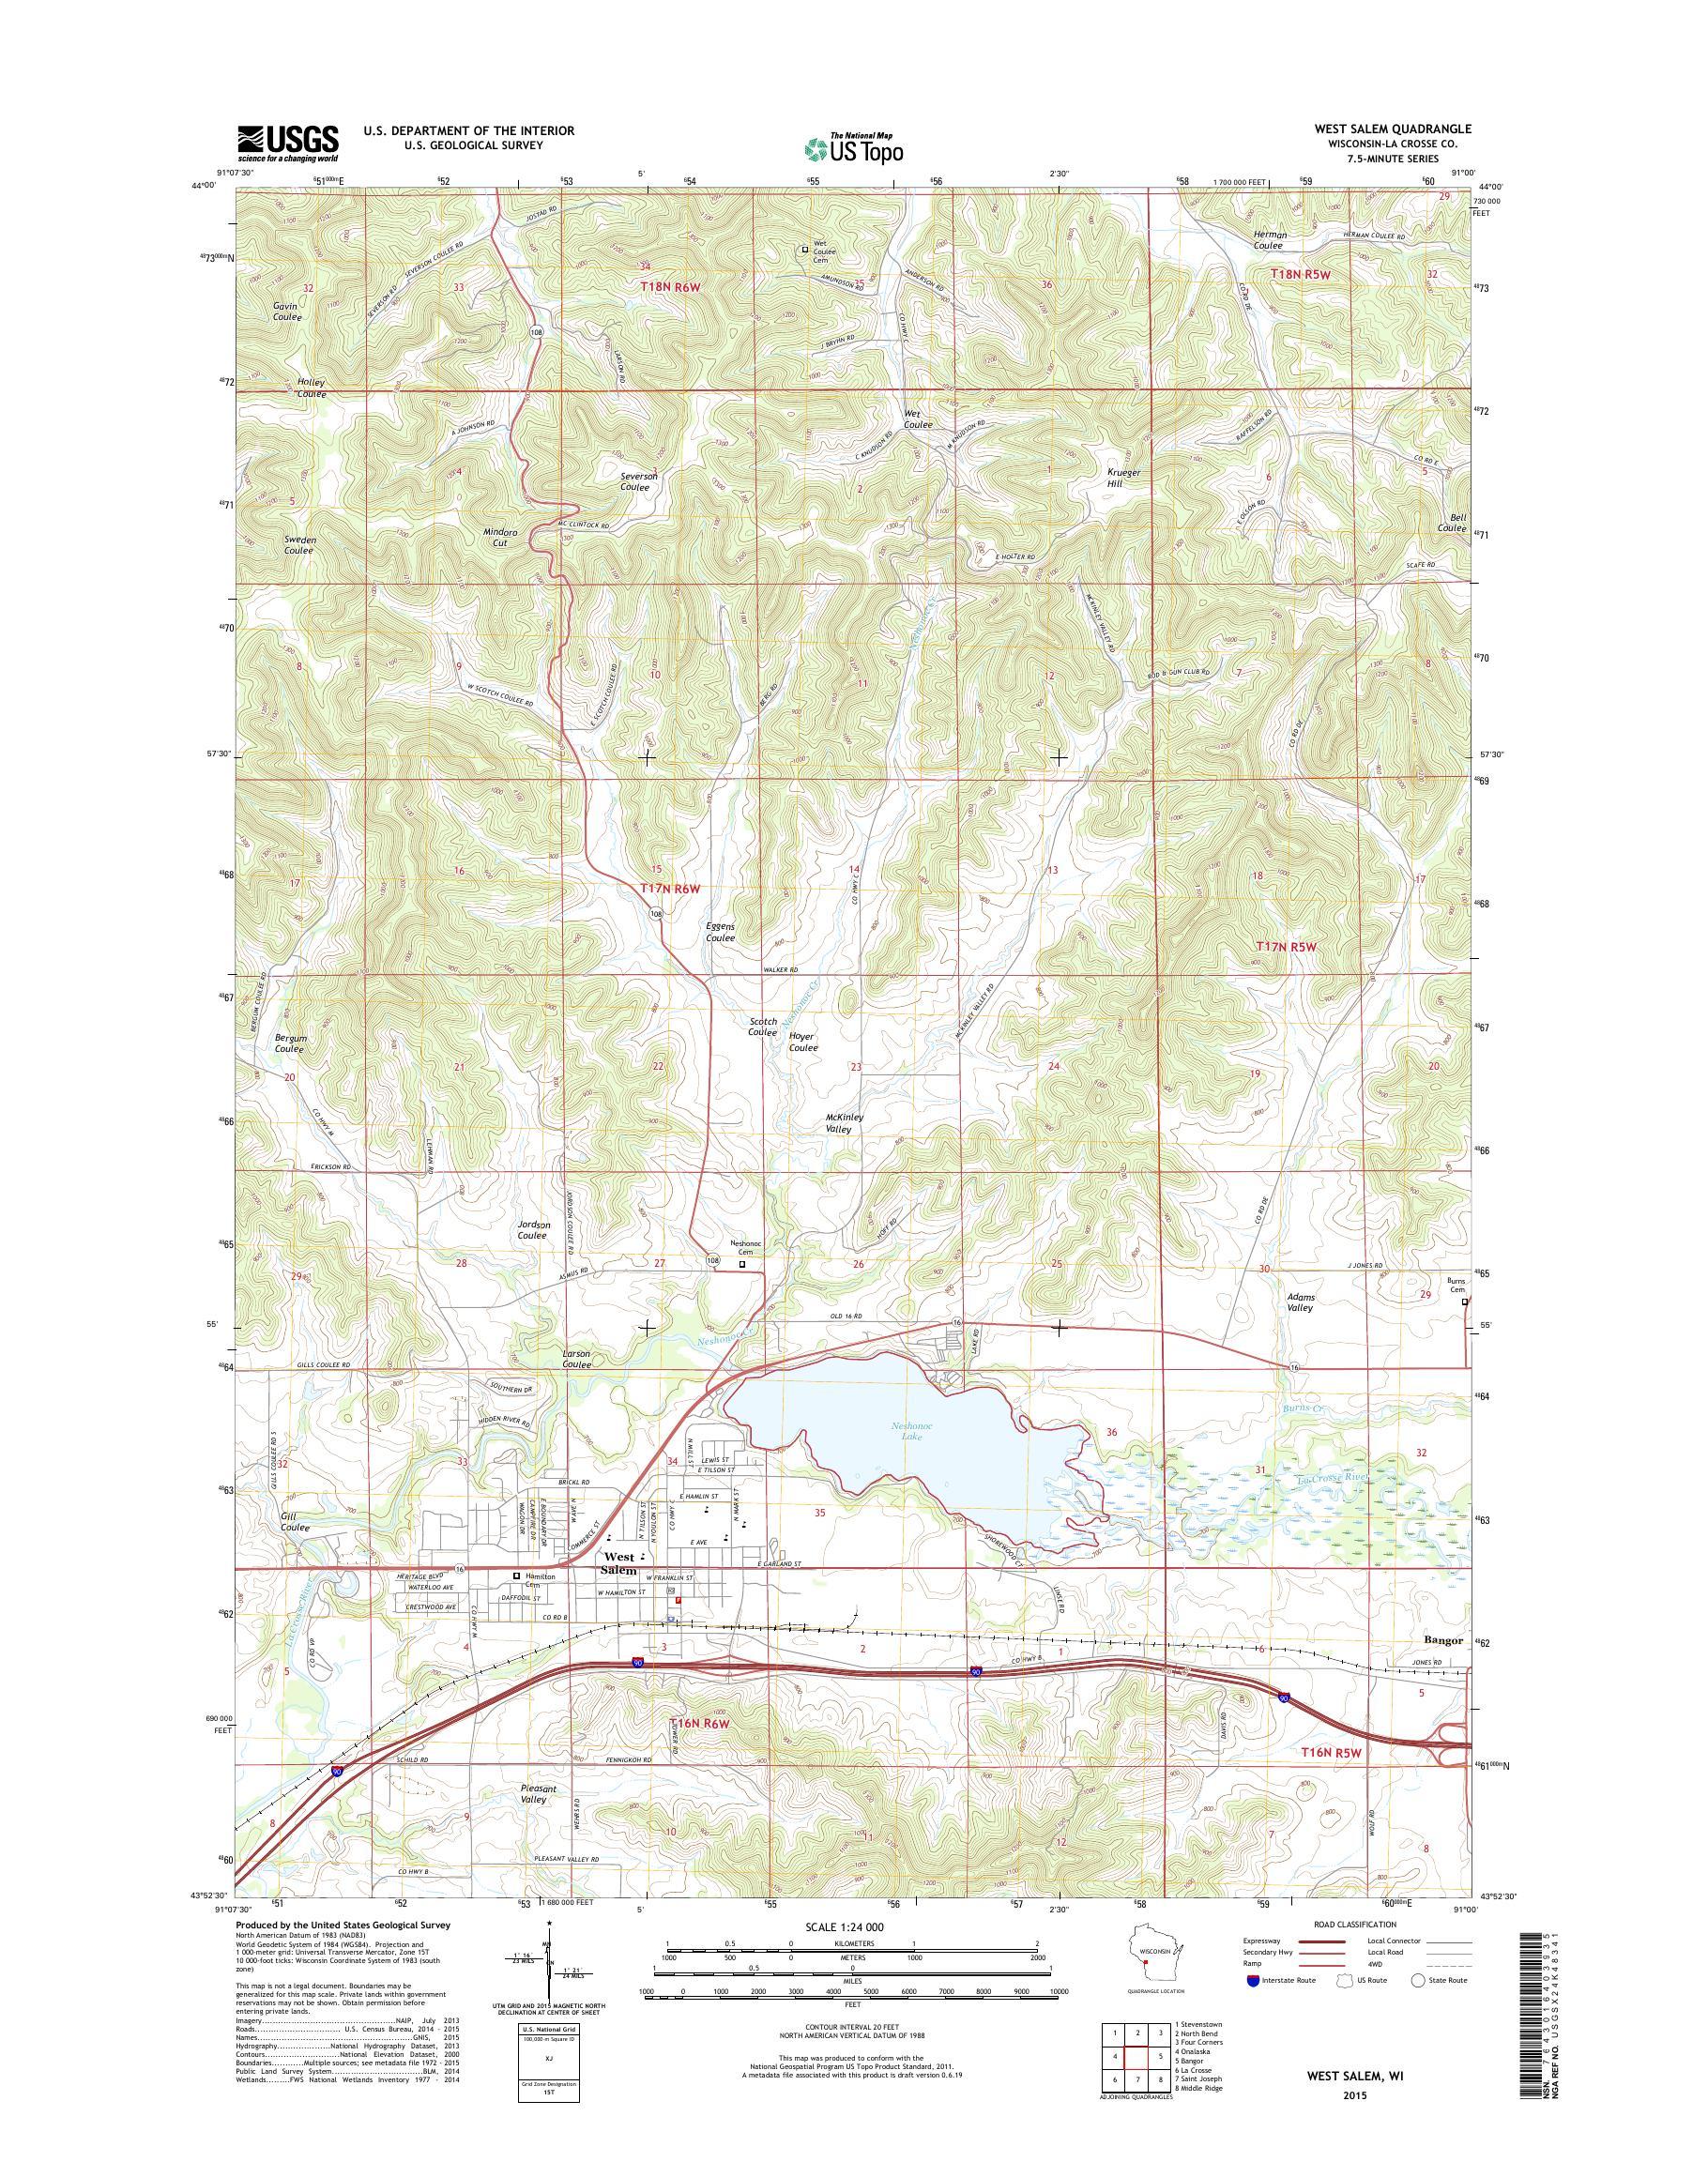 MyTopo West Salem, Wisconsin USGS Quad Topo Map on salem maine map, salem ma tourism map, salem kentucky map, salem nj map, salem ny map, salem mass map, west salem map, salem on a map, salem illinois map, salem oregon map, salem portland map, salem state map, salem boston map, salem ct map, salem wi, salem indiana map, salem massachussets map, salem new hampshire map, salem california map, salem va tax maps,